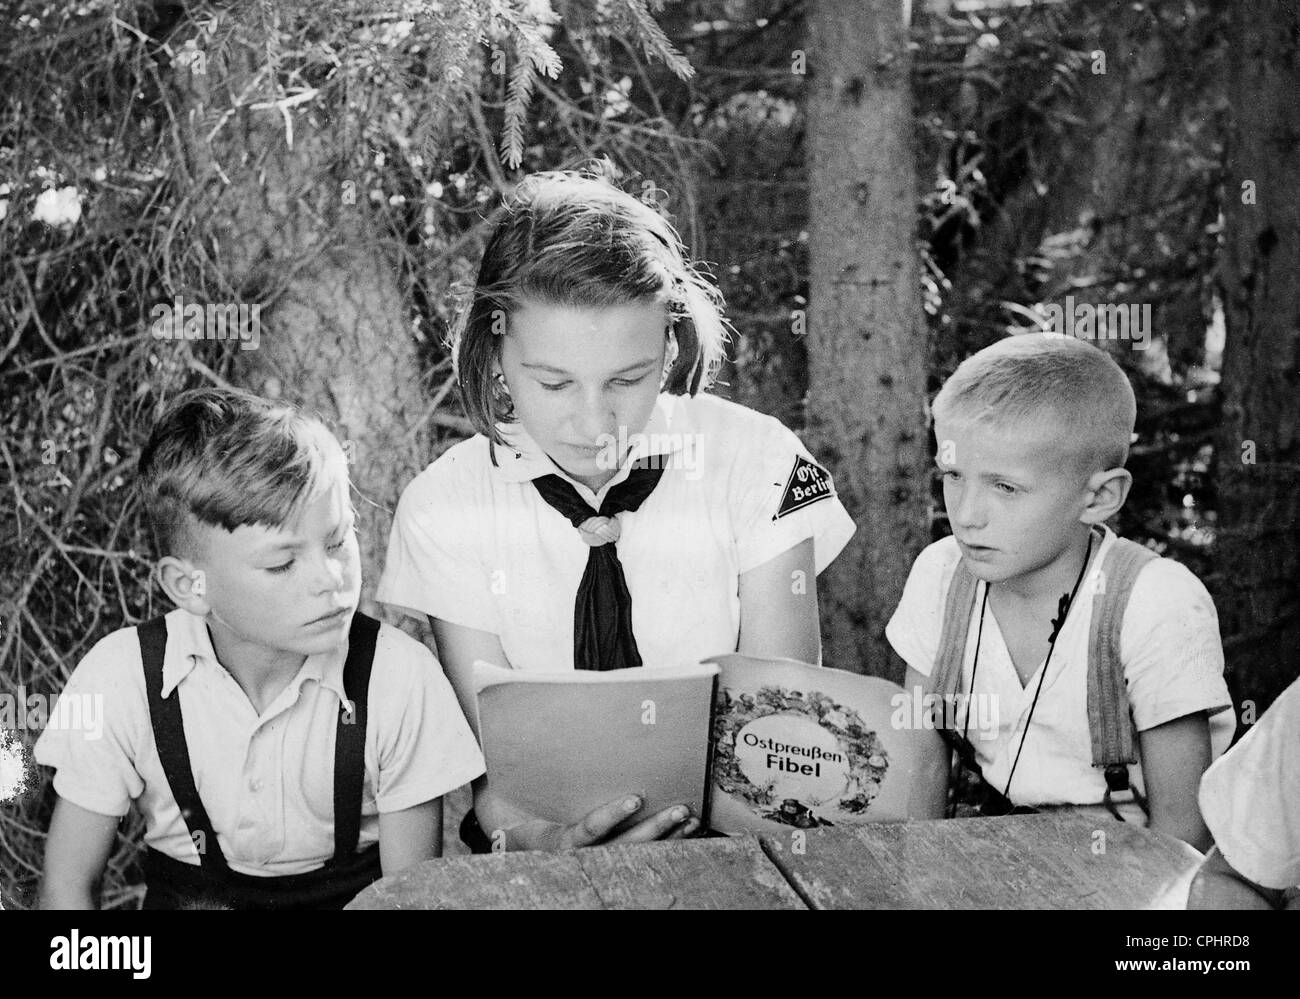 BDM girl looks after children, 1943 - Stock Image